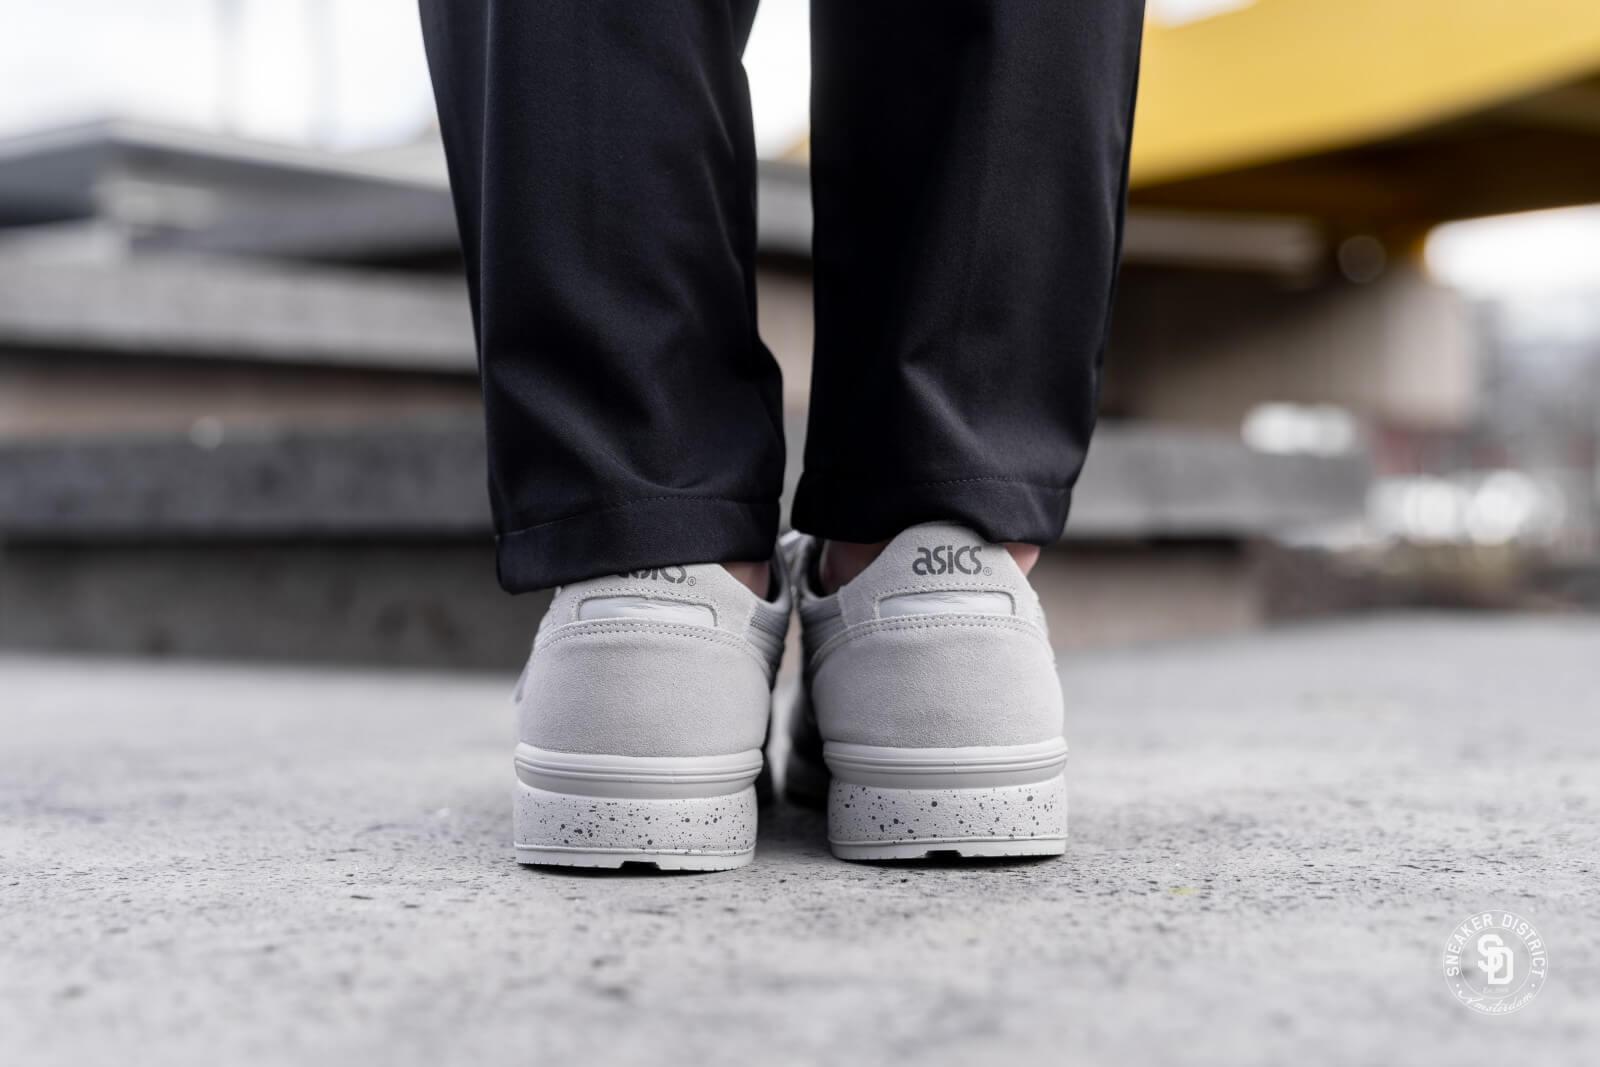 Damen Schuhe sneakers Asics Gel Lyte H8H2L 9696   GRAFITOWY